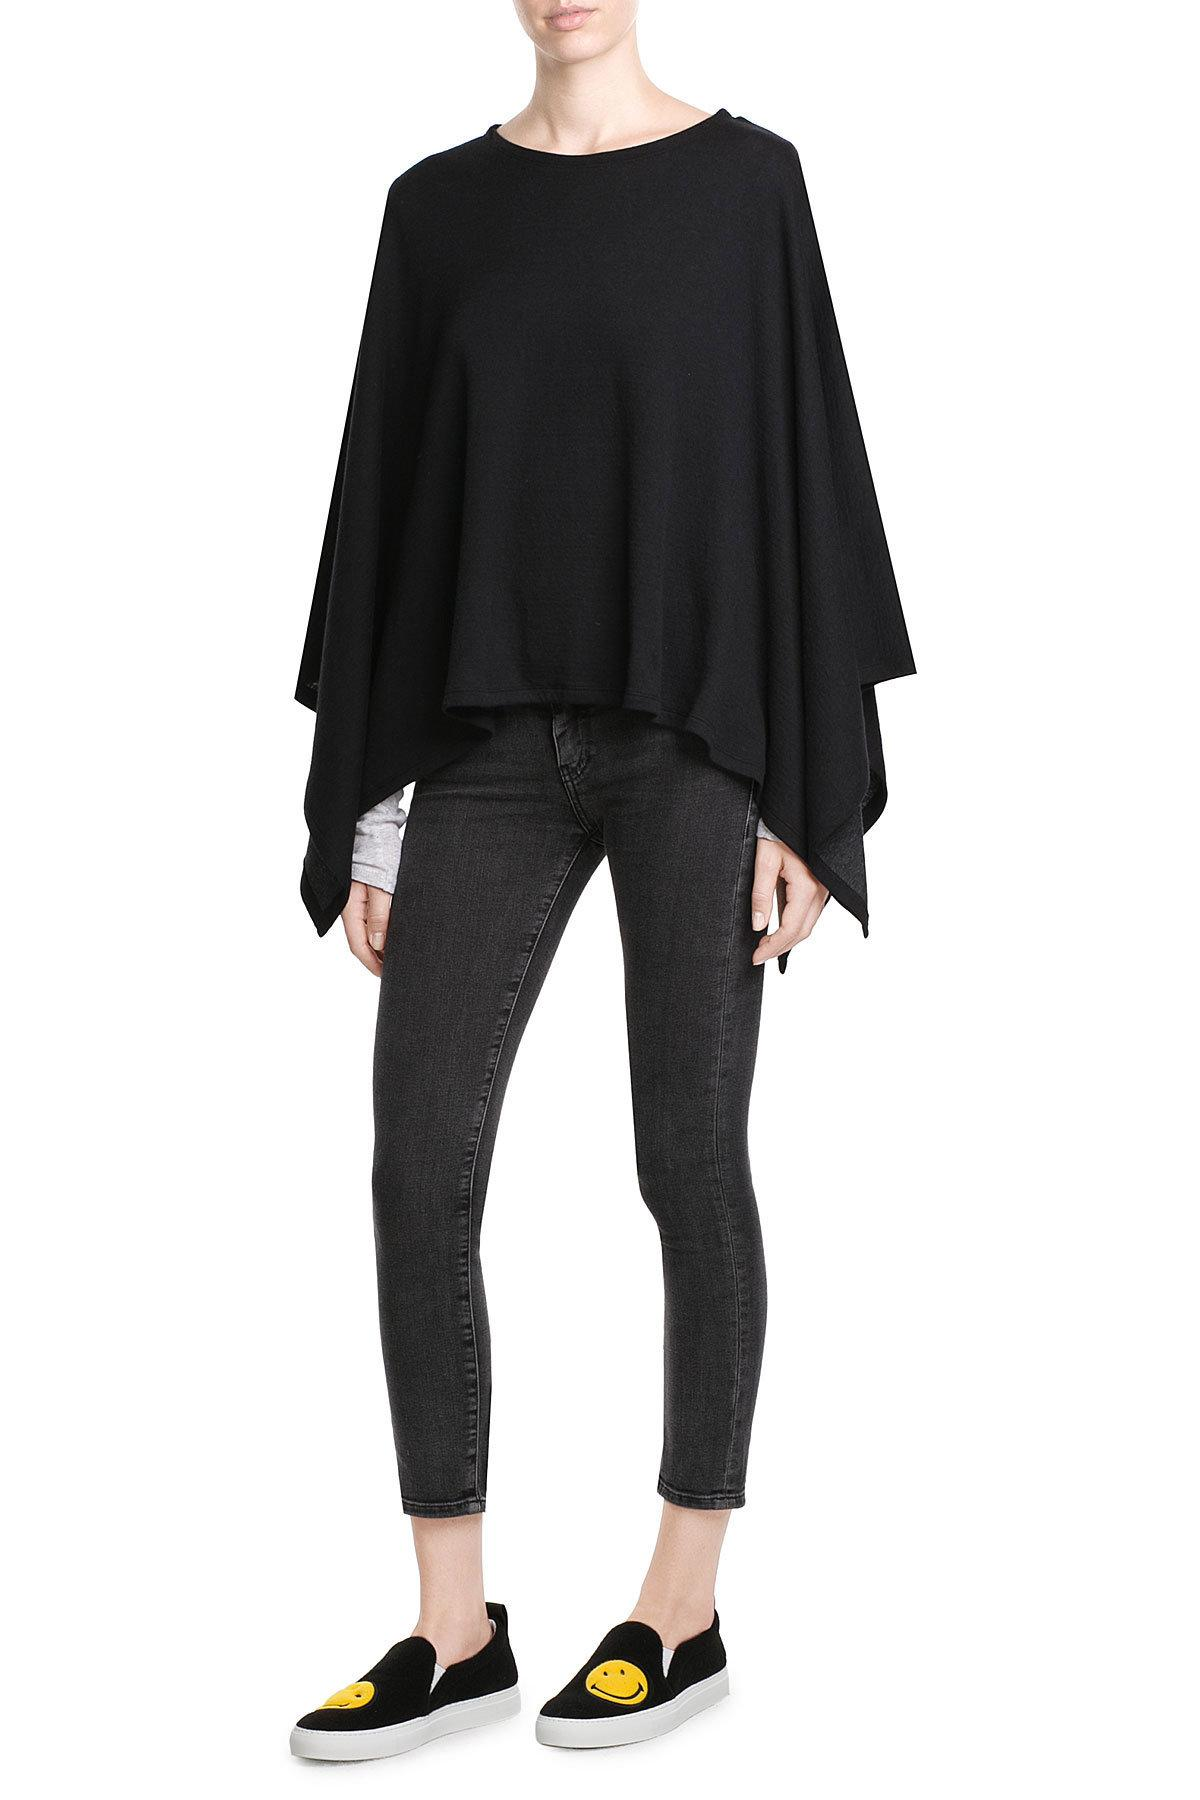 Lyst Majestic Filatures Cotton Cashmere Poncho In Black